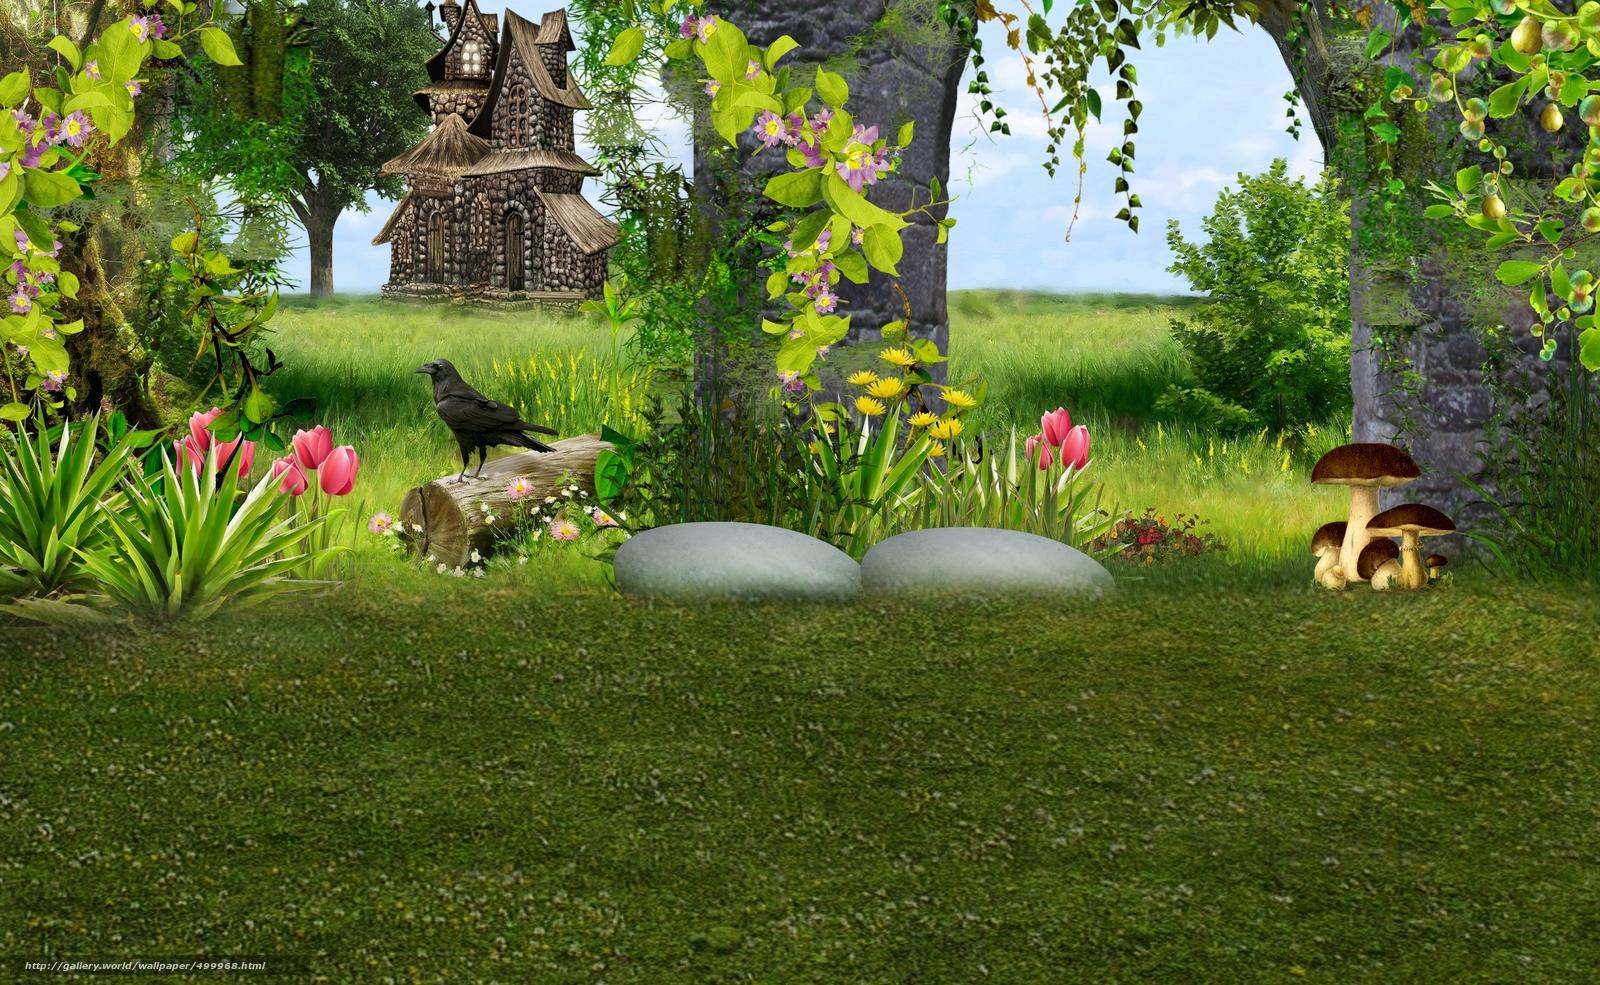 Фото с природой и цветами дляшопа